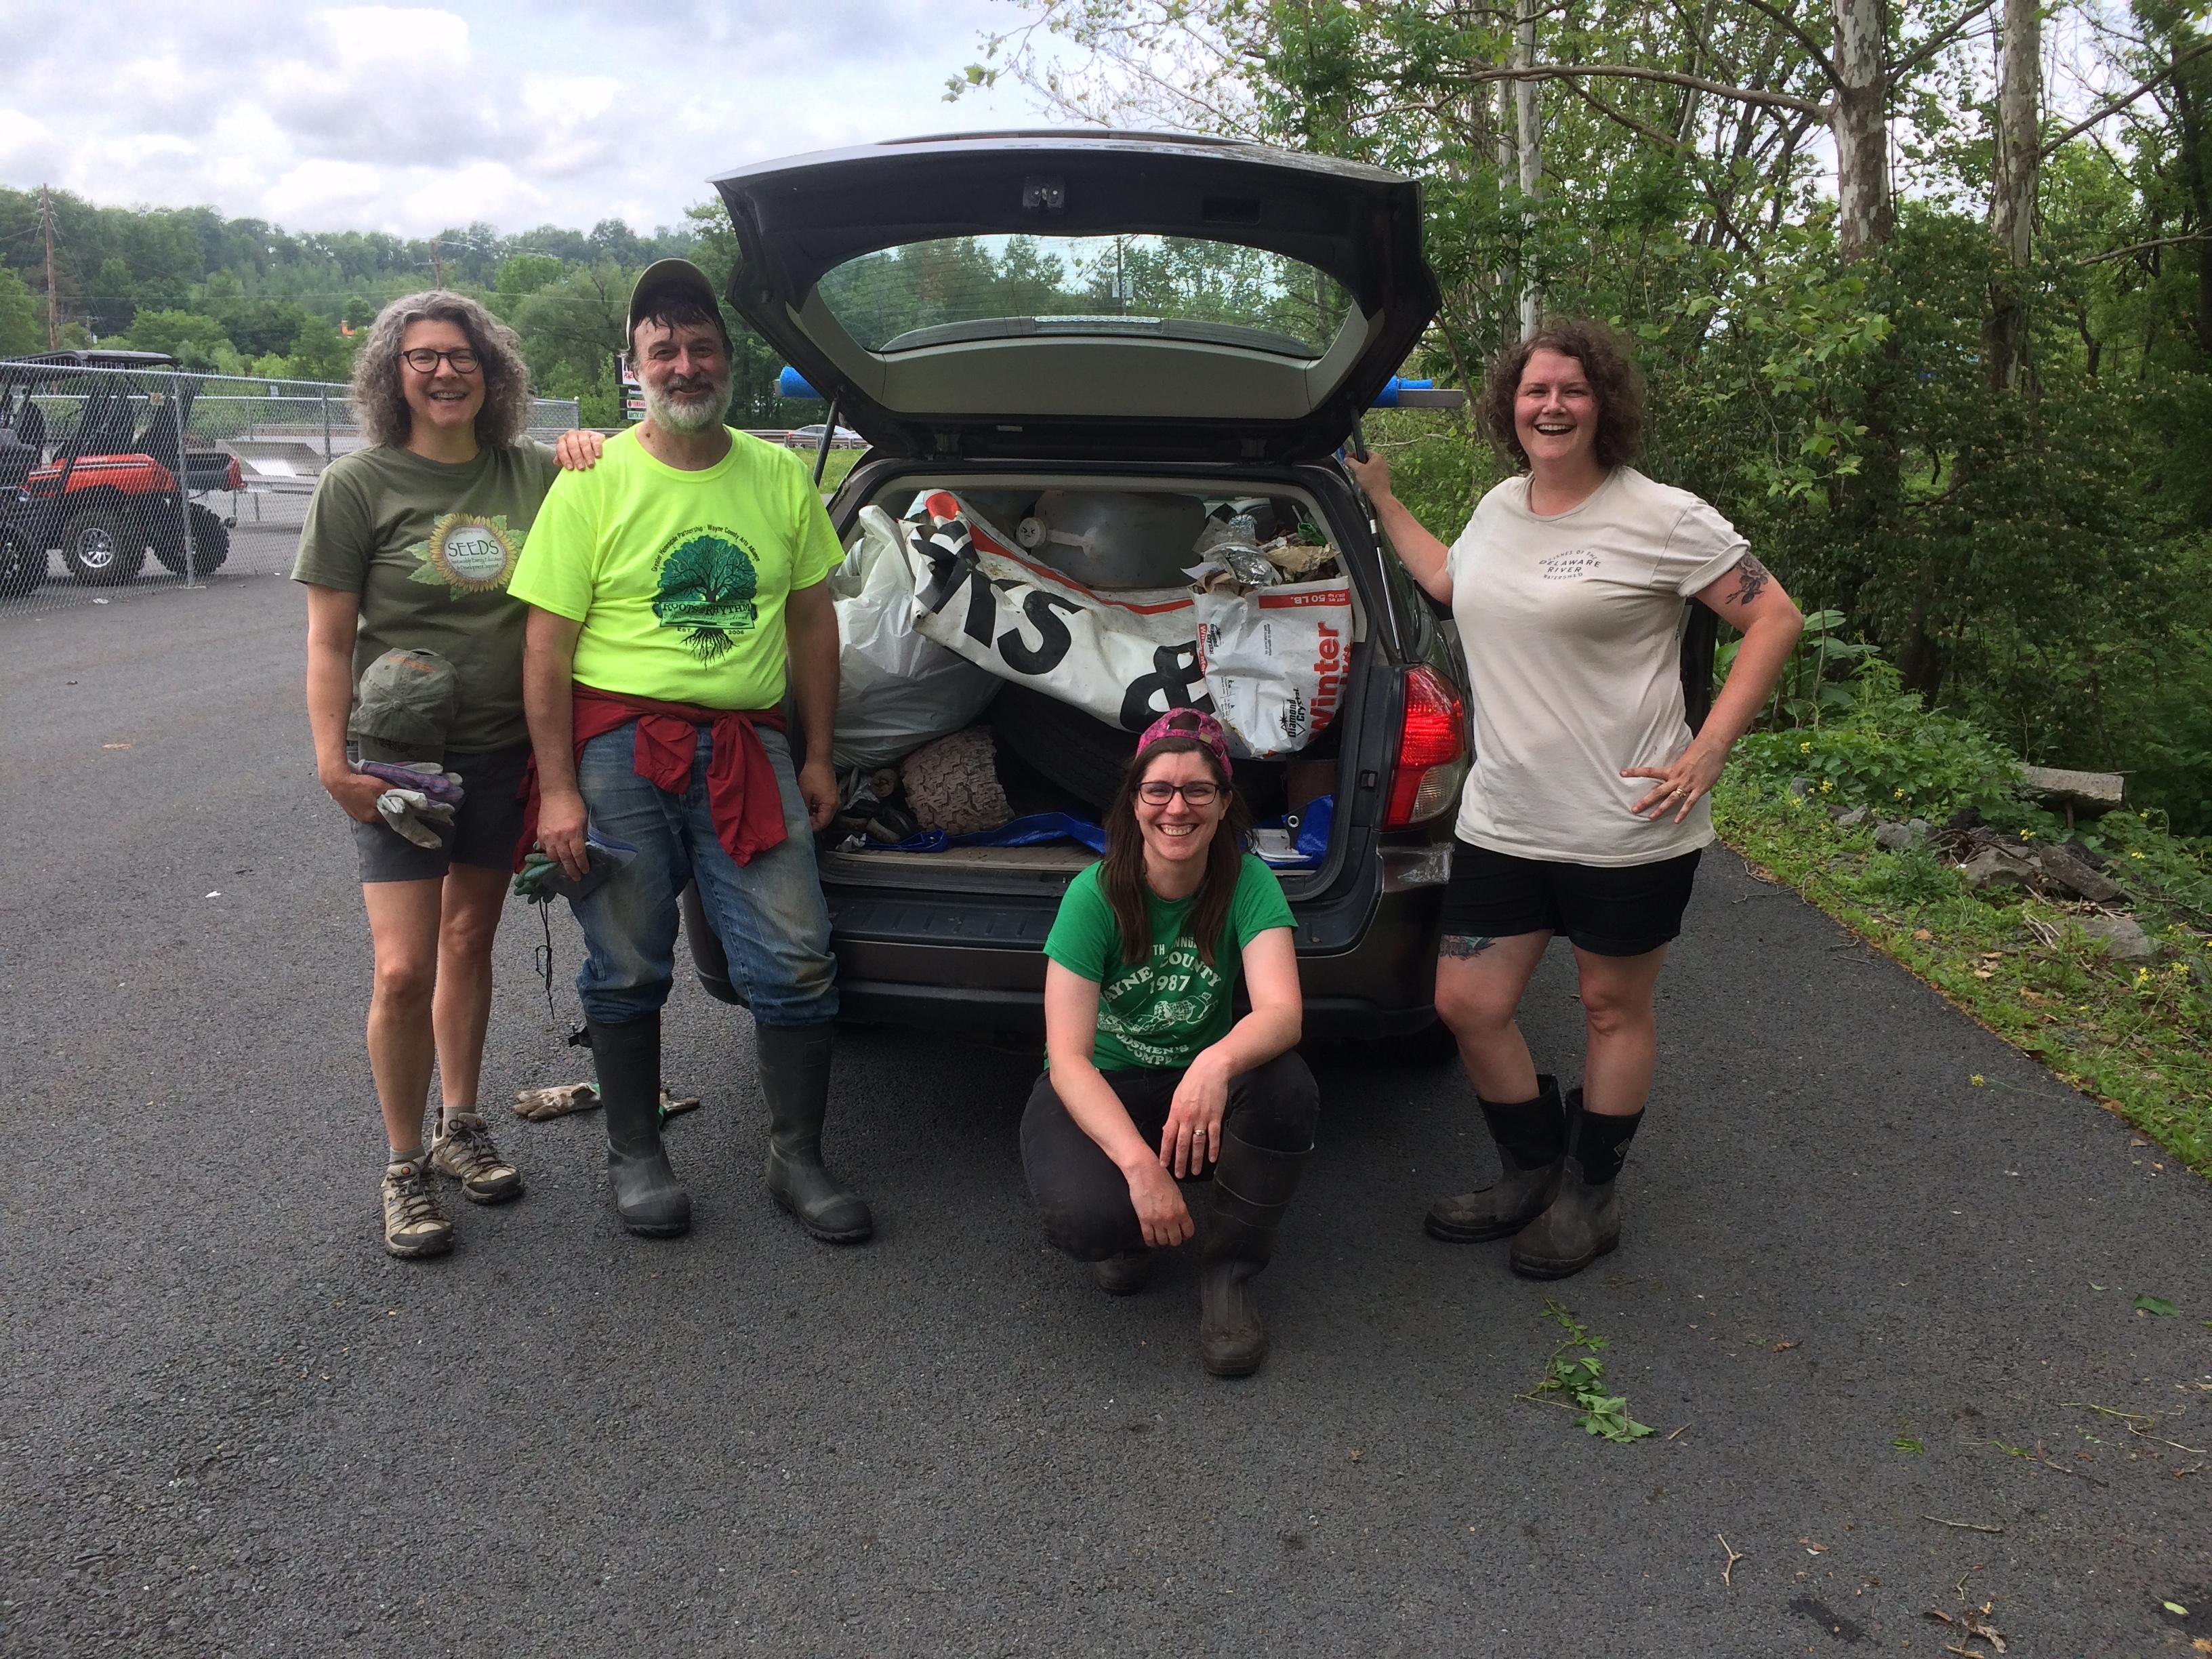 Photo of Seeds Executive Director Sandy Long, Board Member Jack Barnett, and Ashley and Sarah Hall-Bagdonas at the Lackawaxen River Clean Up.